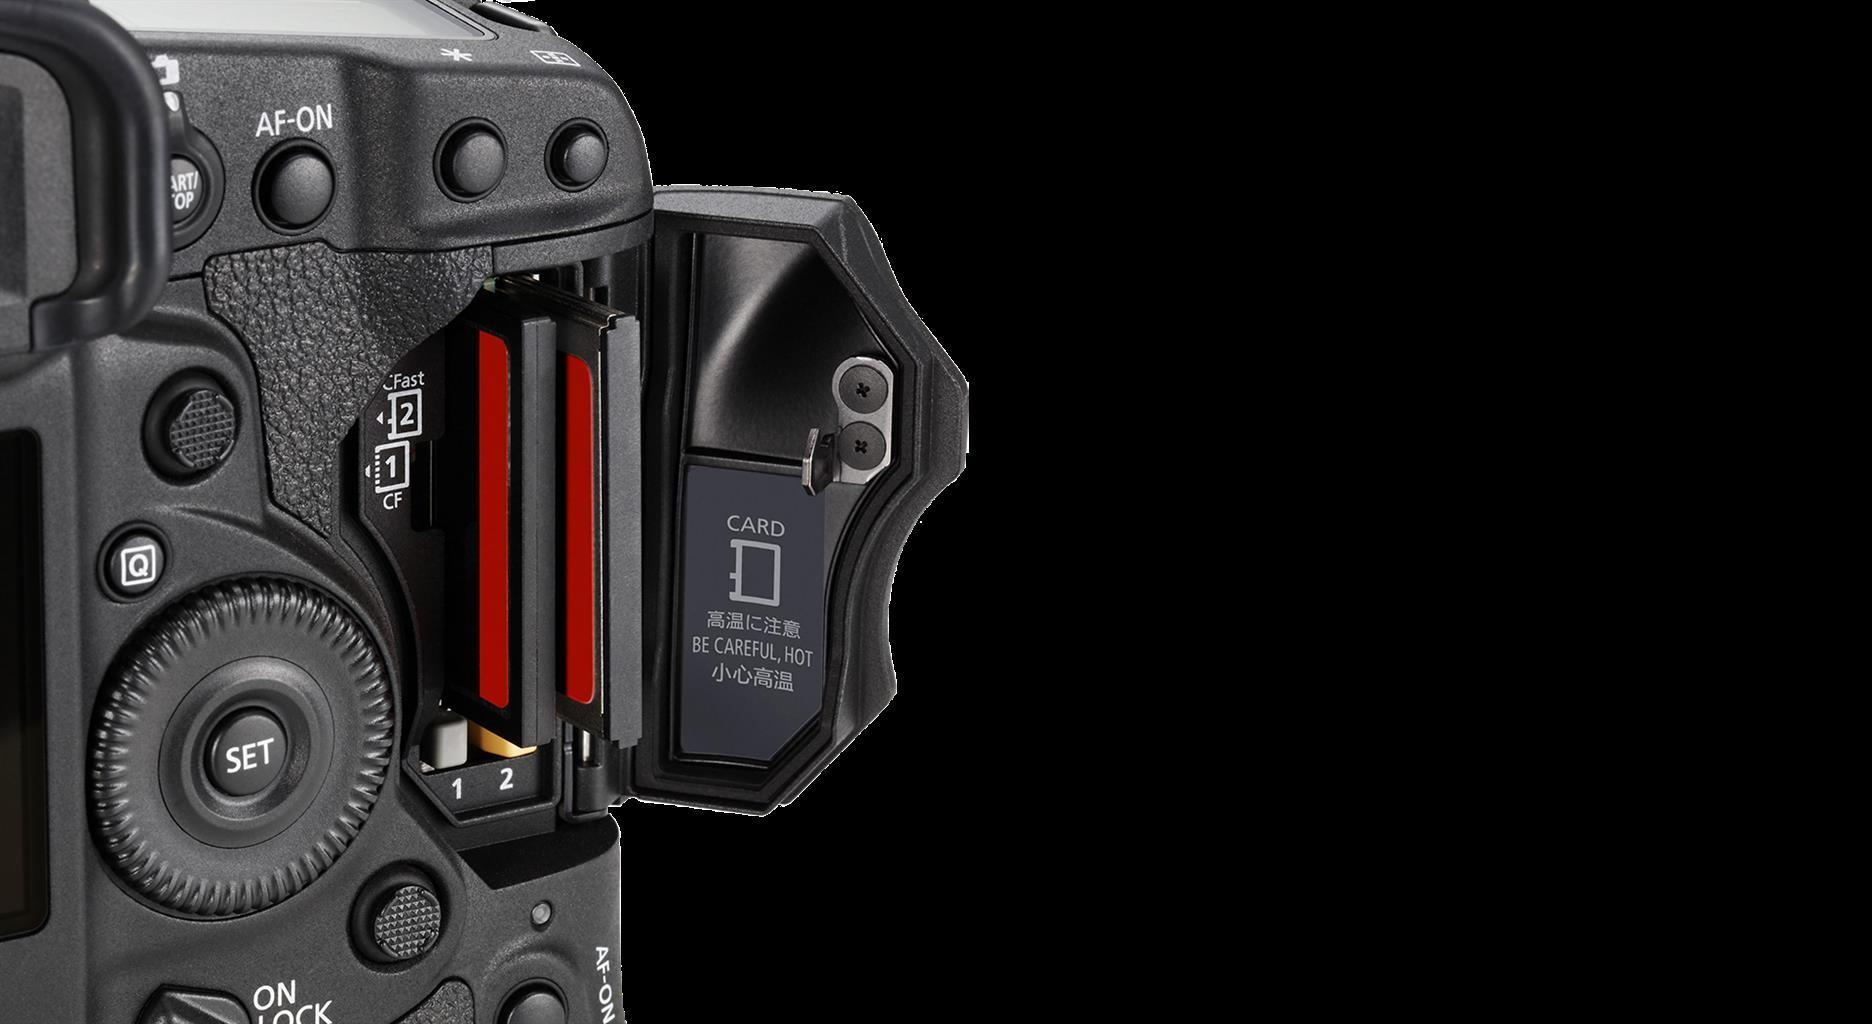 Canon EOS 1D-S Mark ii plus 50mm Canon Lens - R12,950